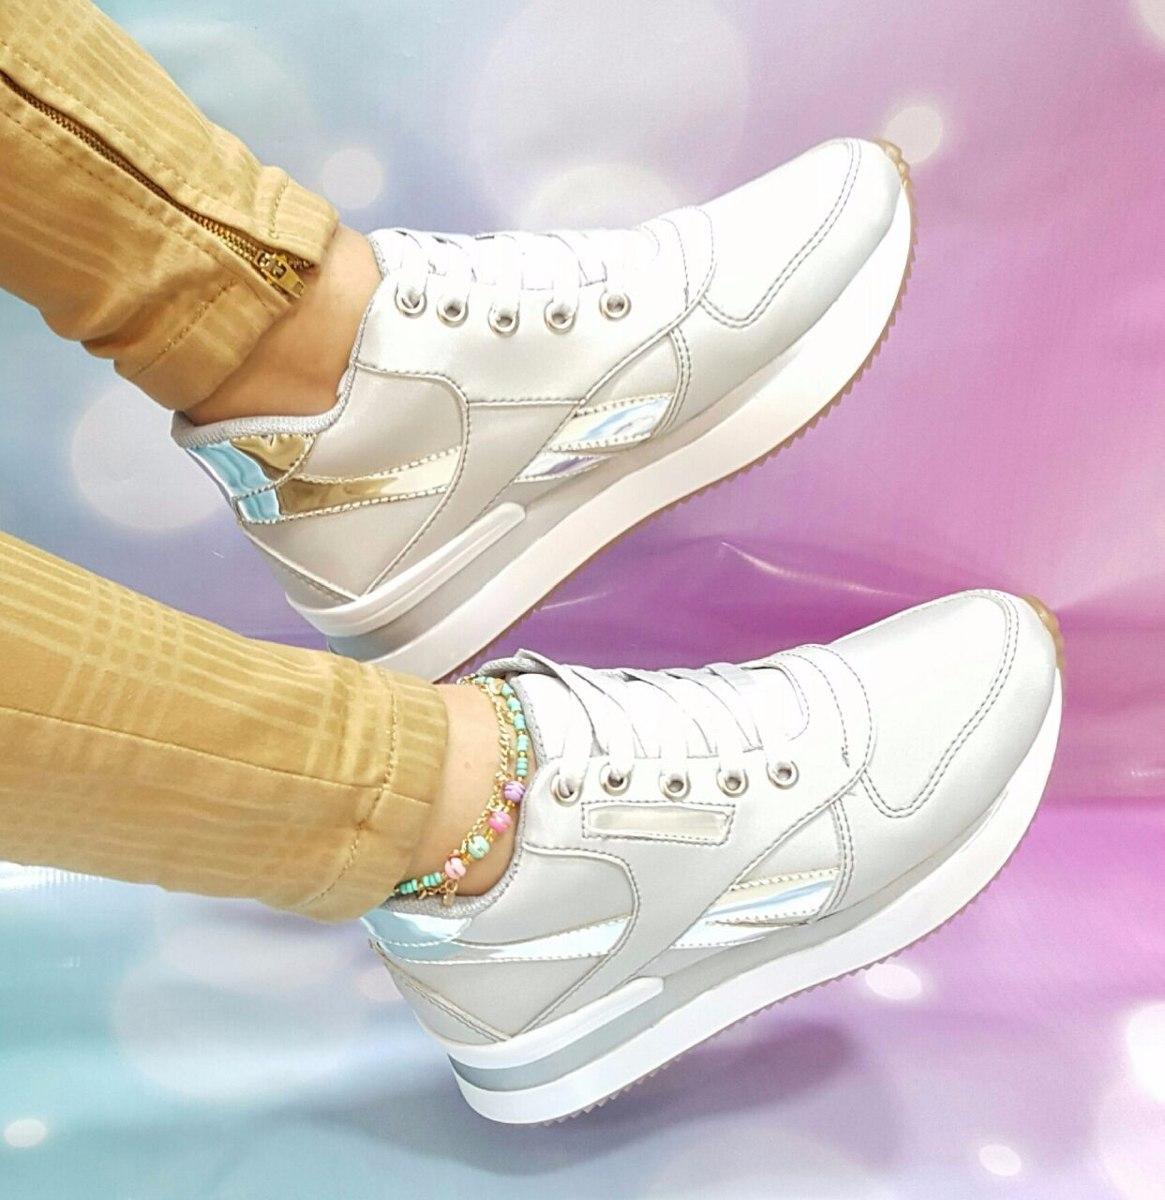 5c88706b03 zapato tenis deportivo moda 2017 damas mujeres plateado. Cargando zoom.